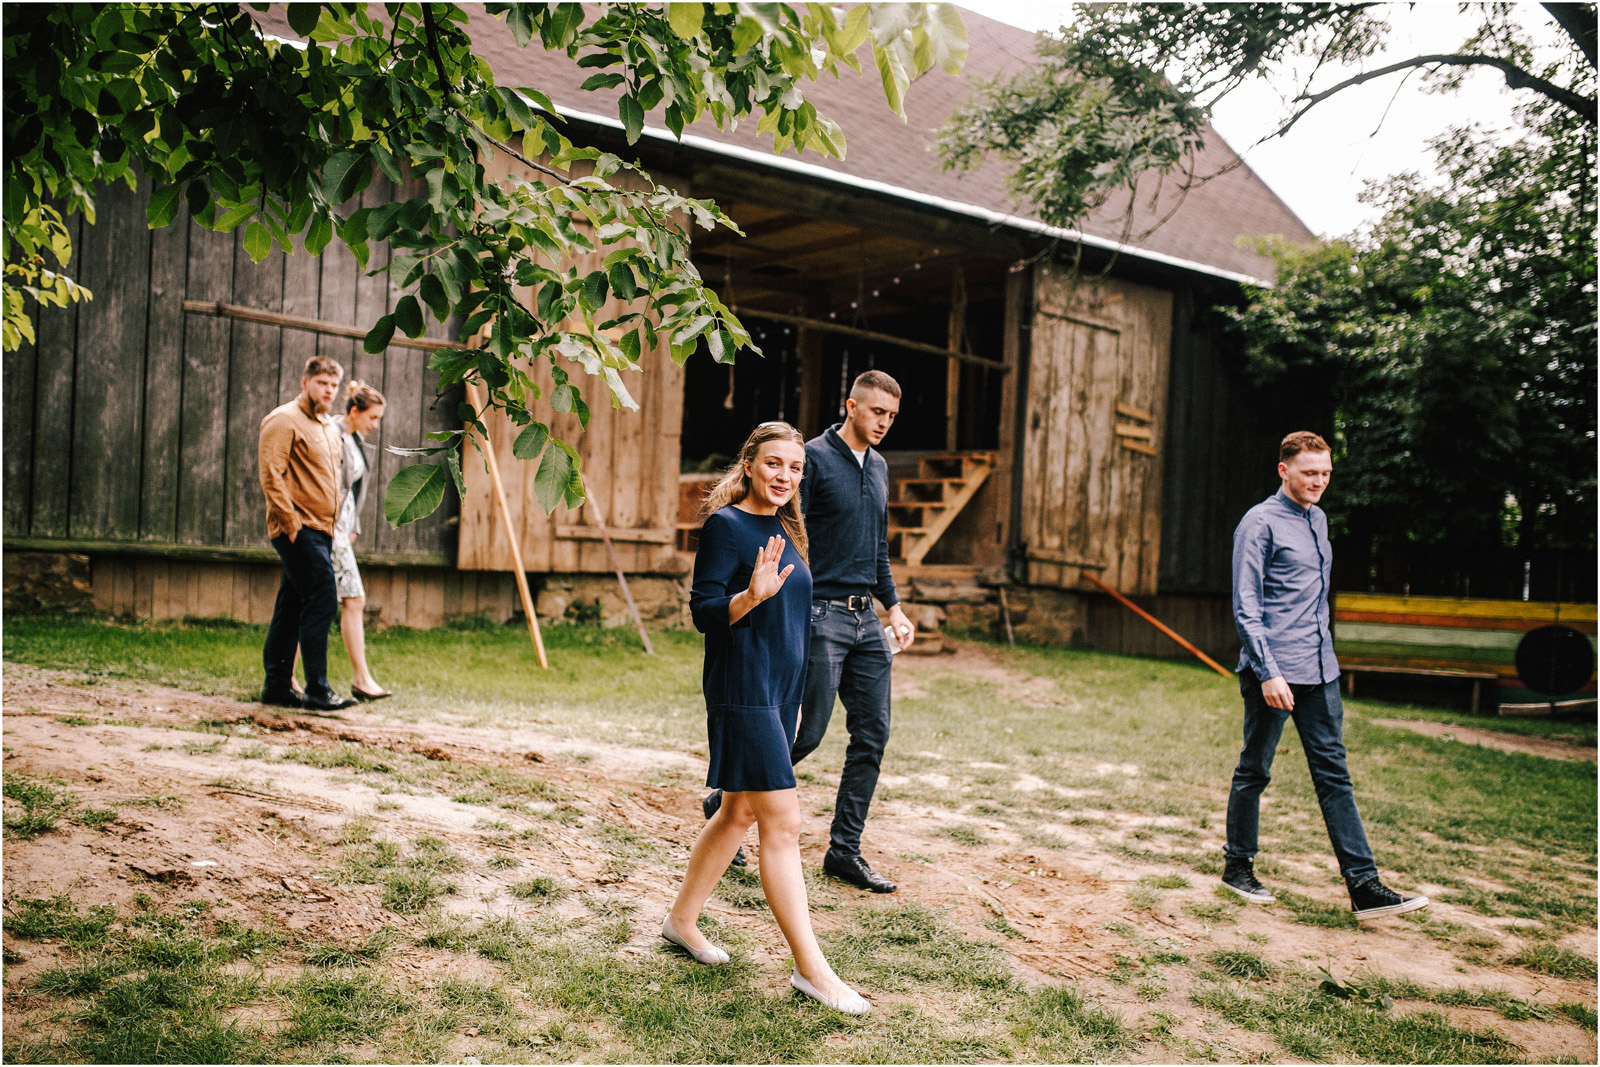 Agatka & Mati | garden party i impreza w stodole 28